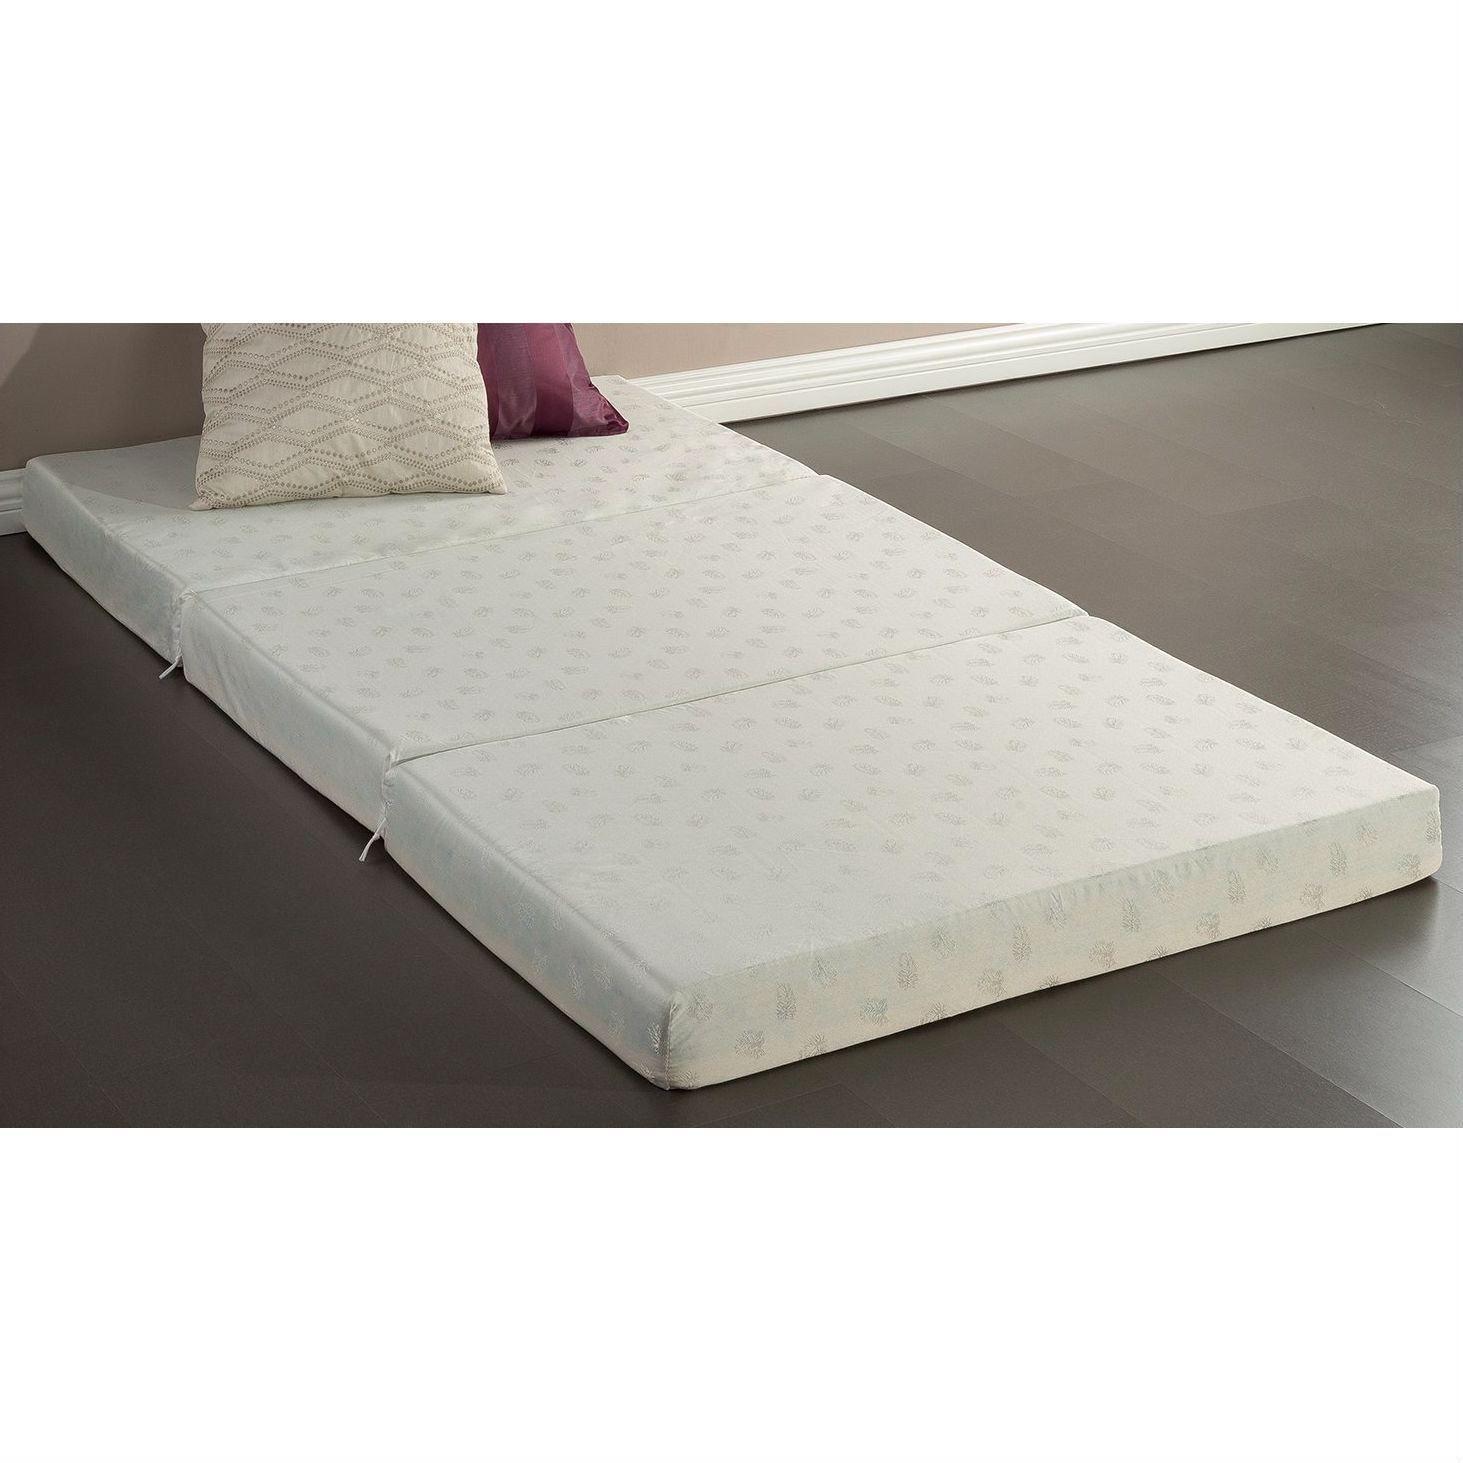 spa mats colors foam sensations memory itm mat youth mattress multiple twin